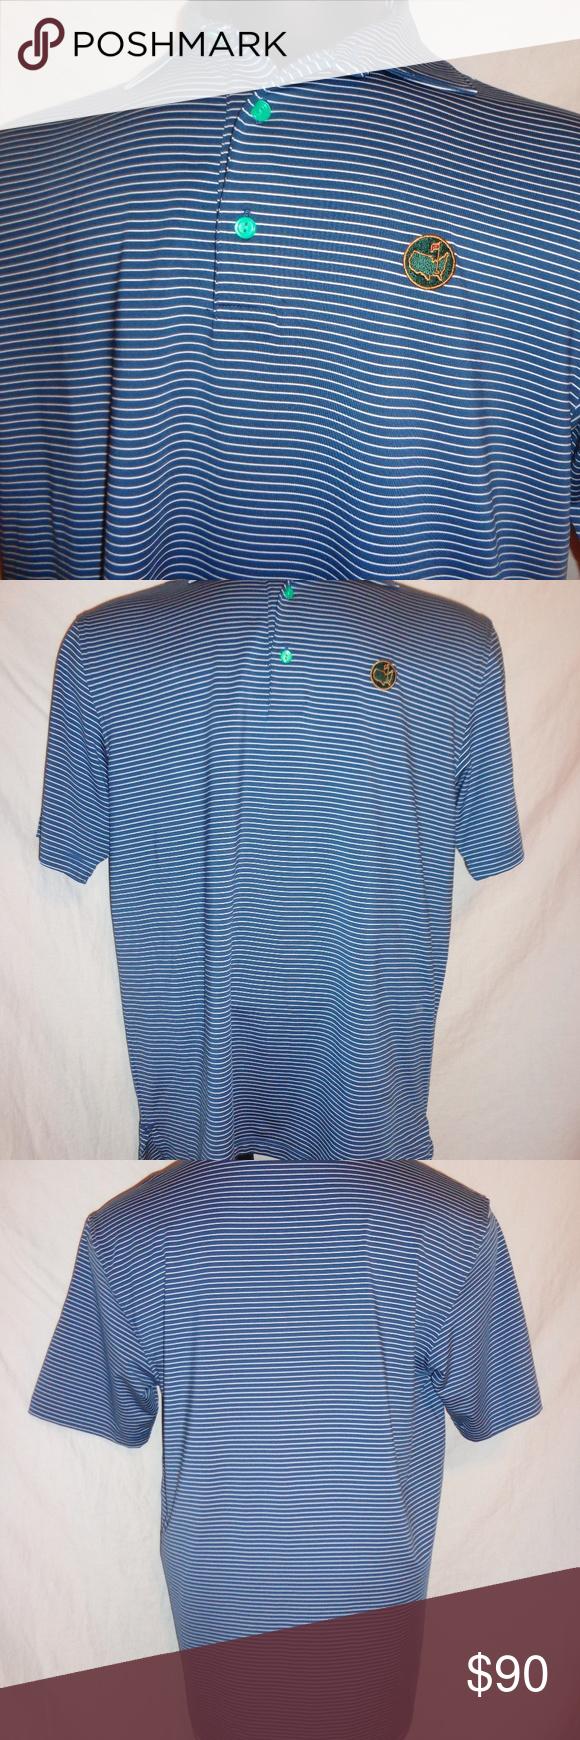 Peter Millar Blue Striped Masters Golf Polo Shirt Peter